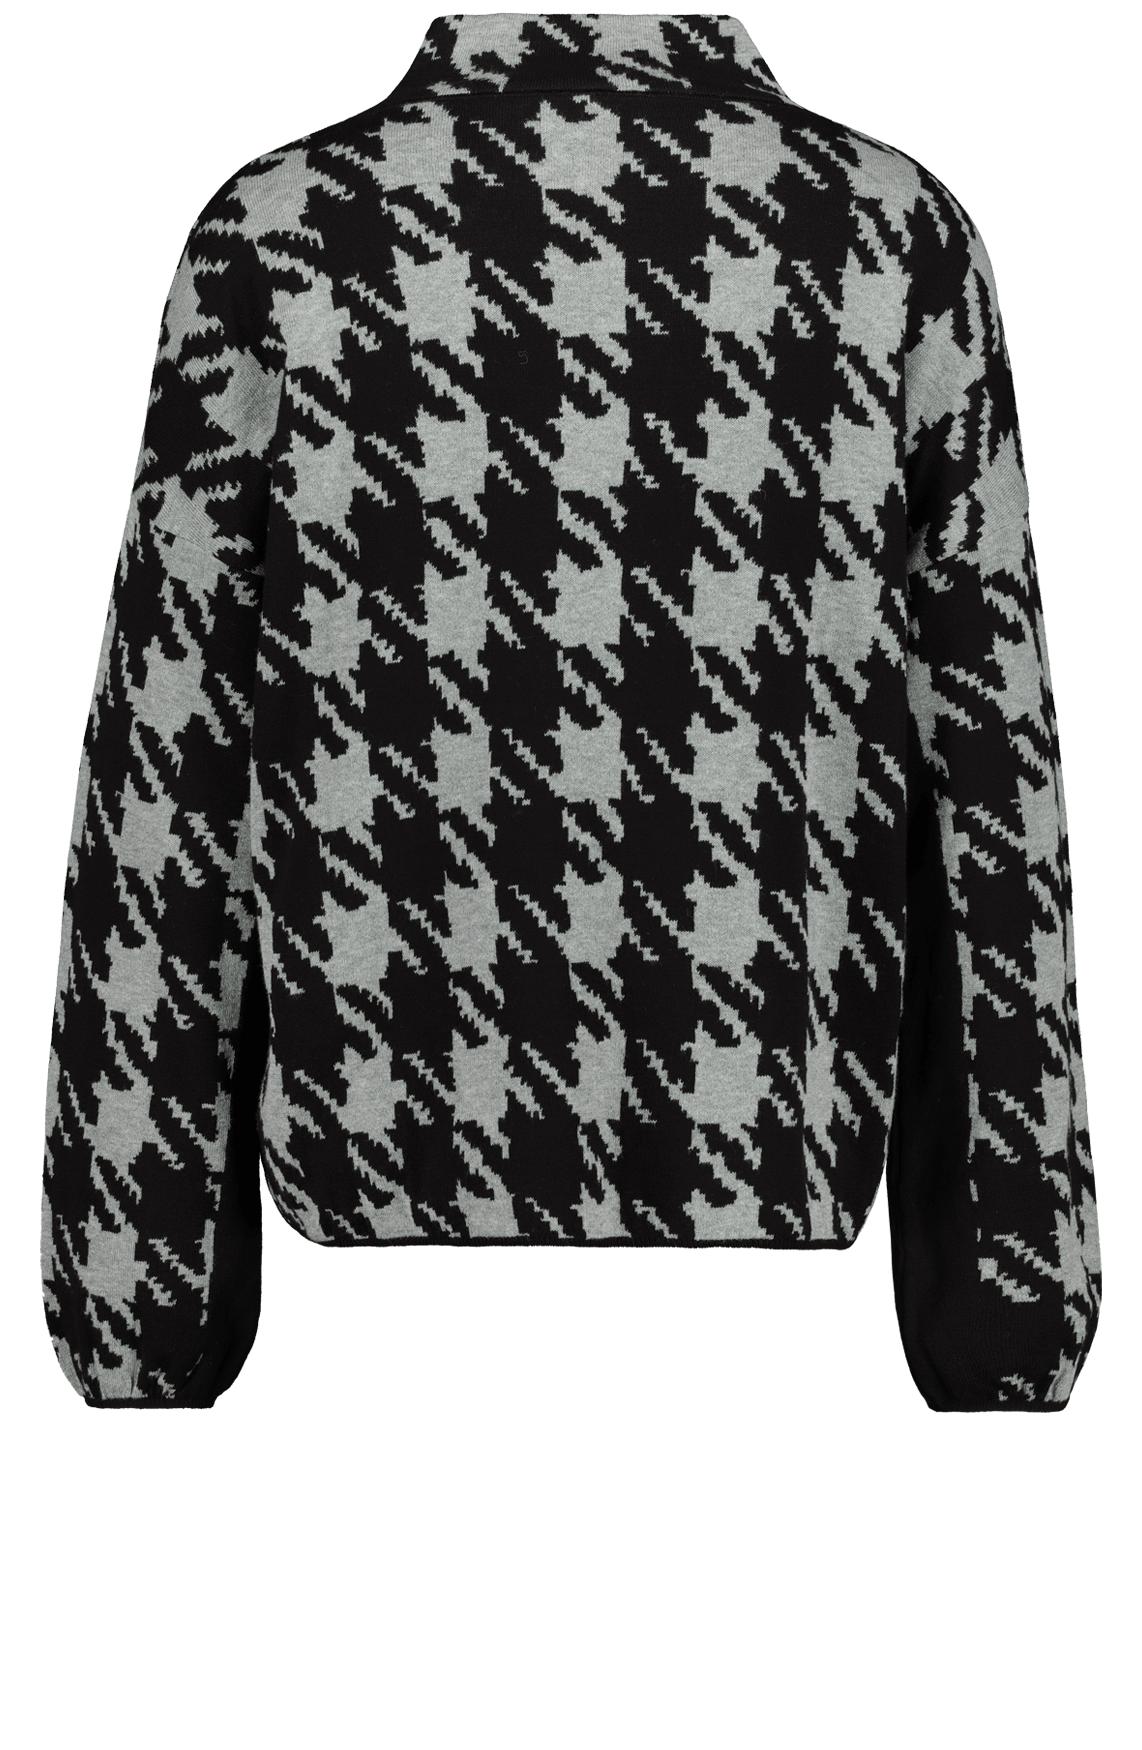 Monari Dames Pied-de-poule trui zwart